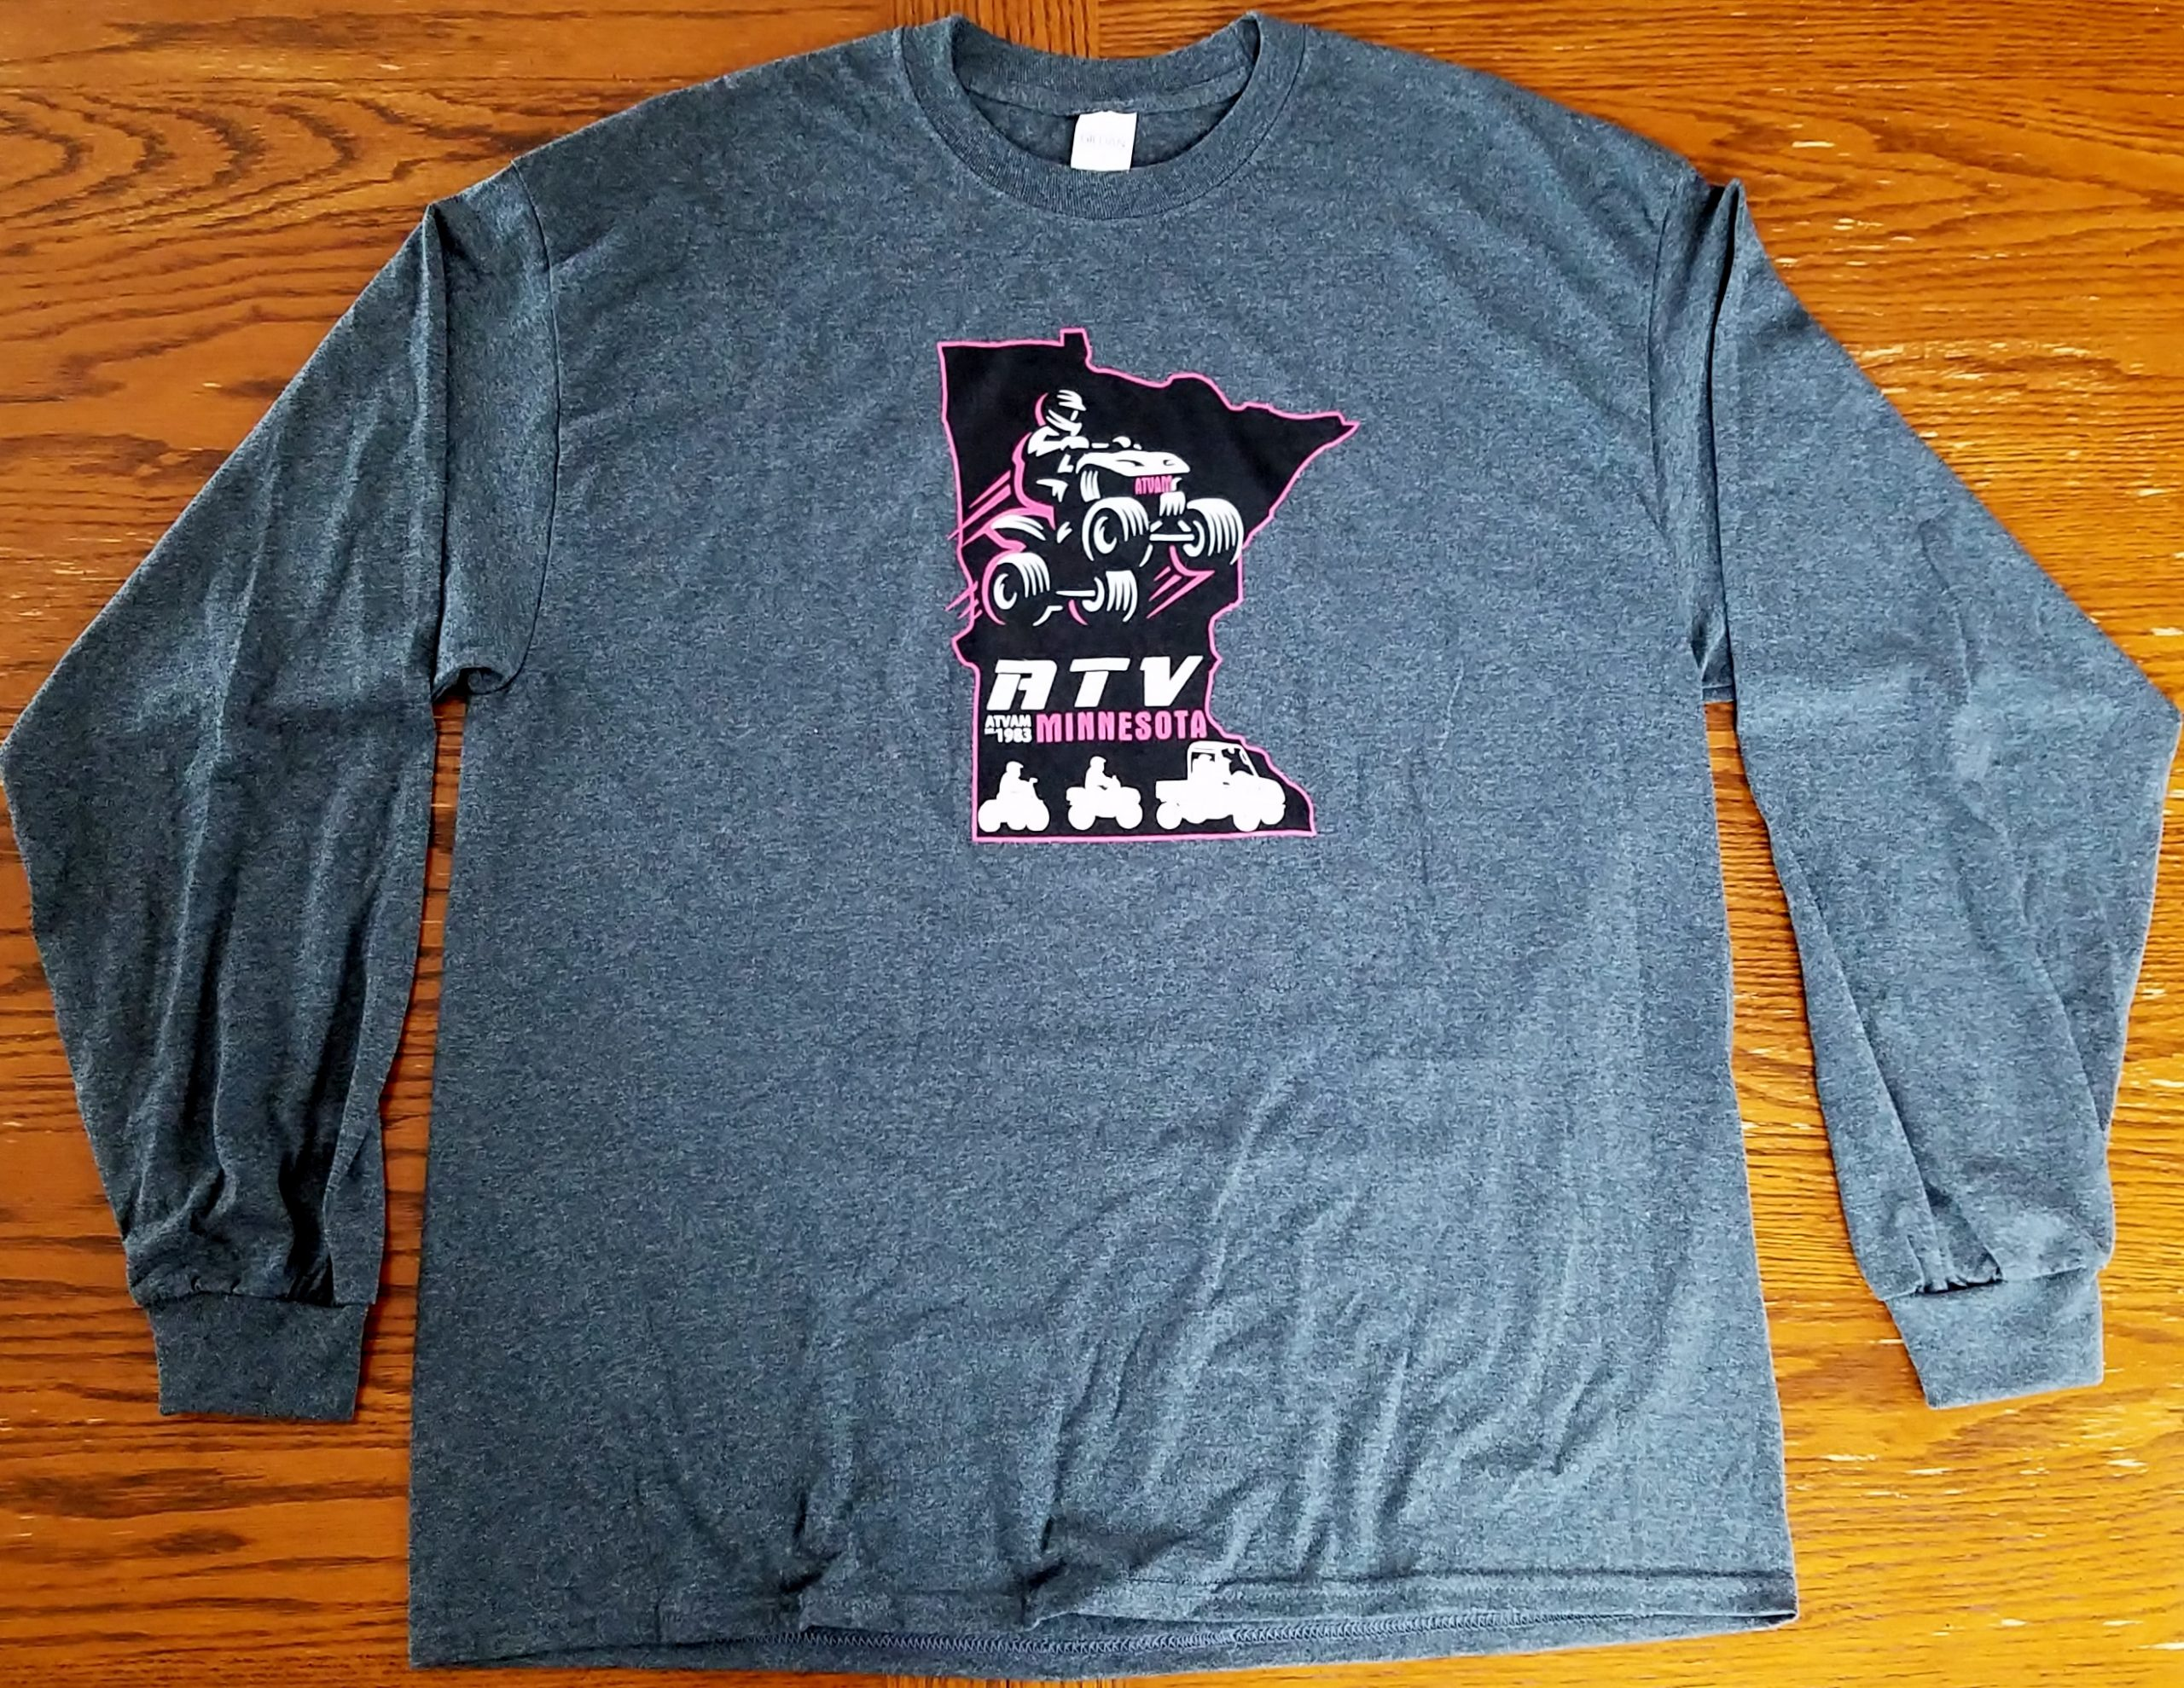 MN ATVAM Long Sleeve T-Shirt - Pink_Black